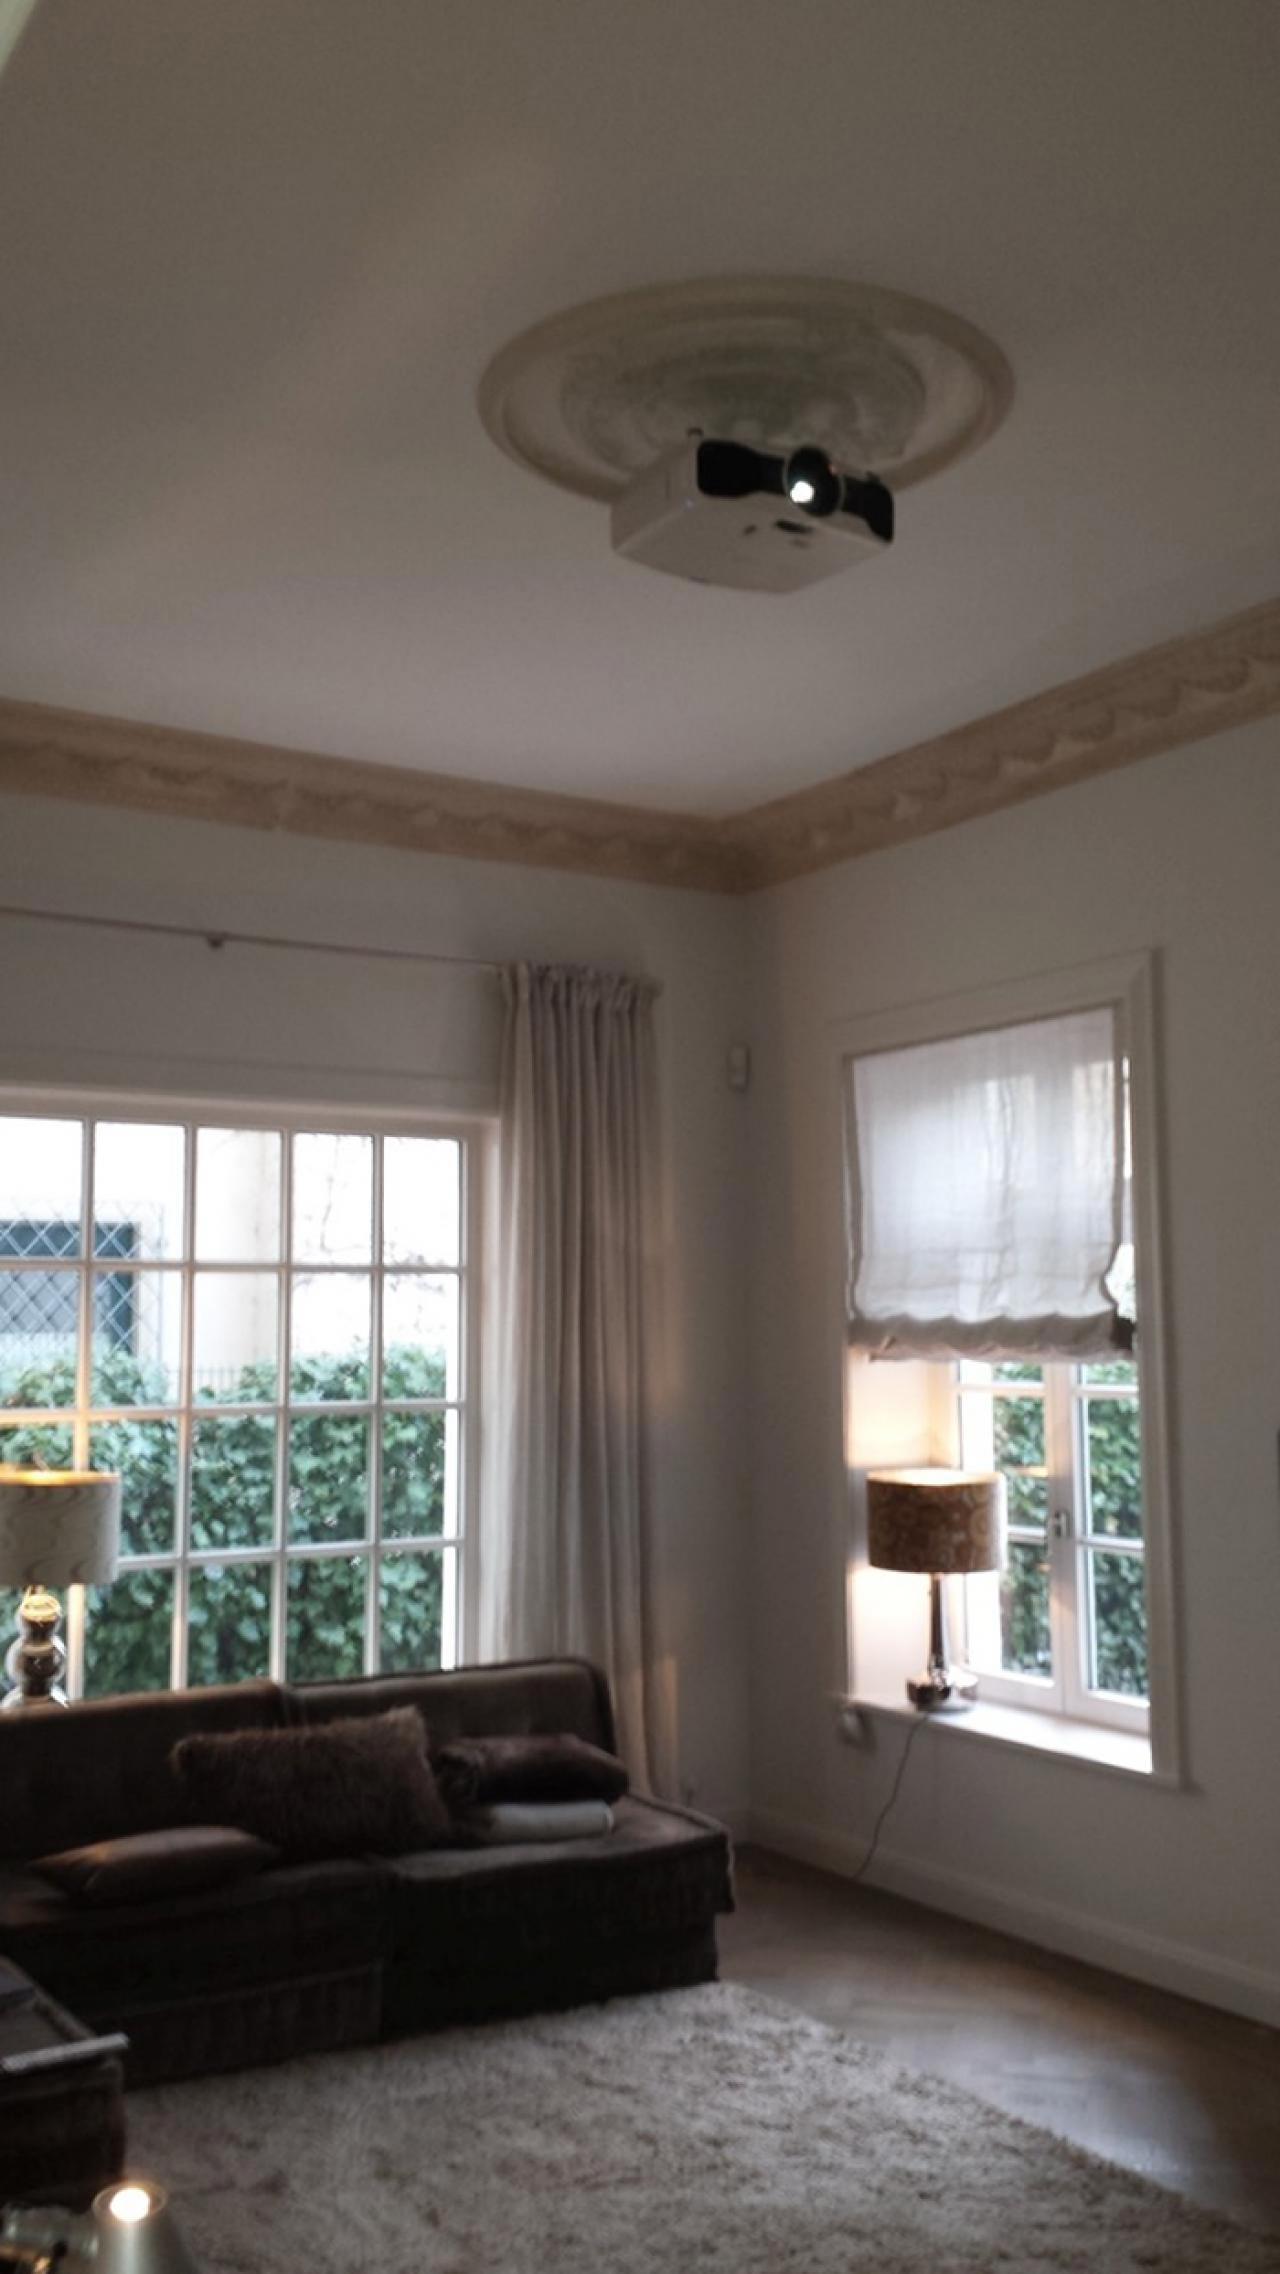 heimkino villa garden. Black Bedroom Furniture Sets. Home Design Ideas